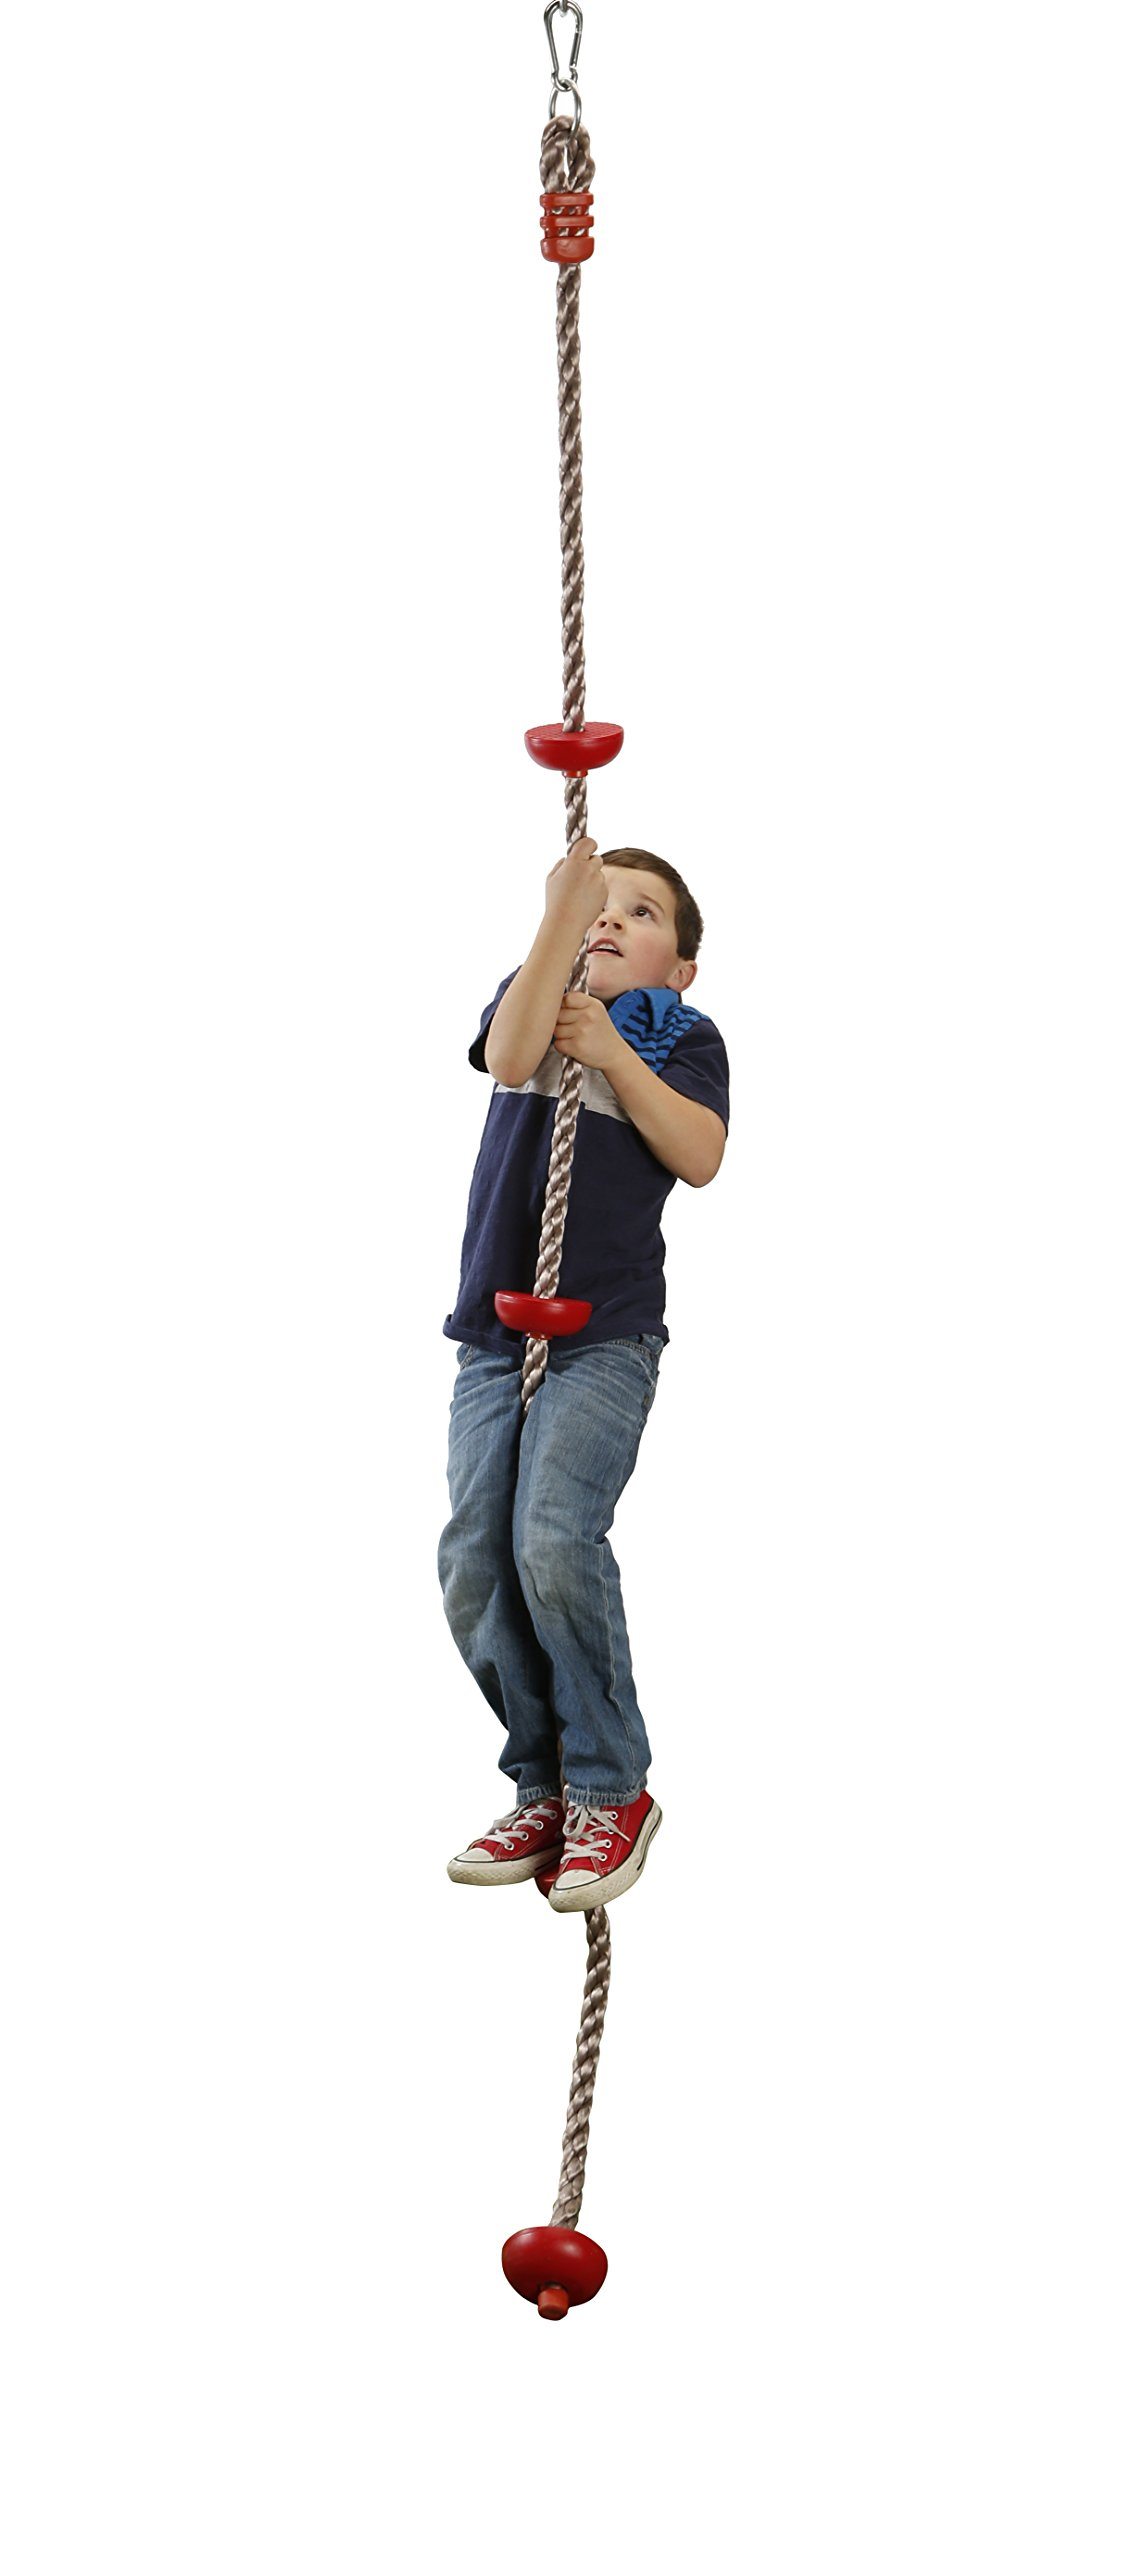 Slackers Ninjaline Climbing Rope